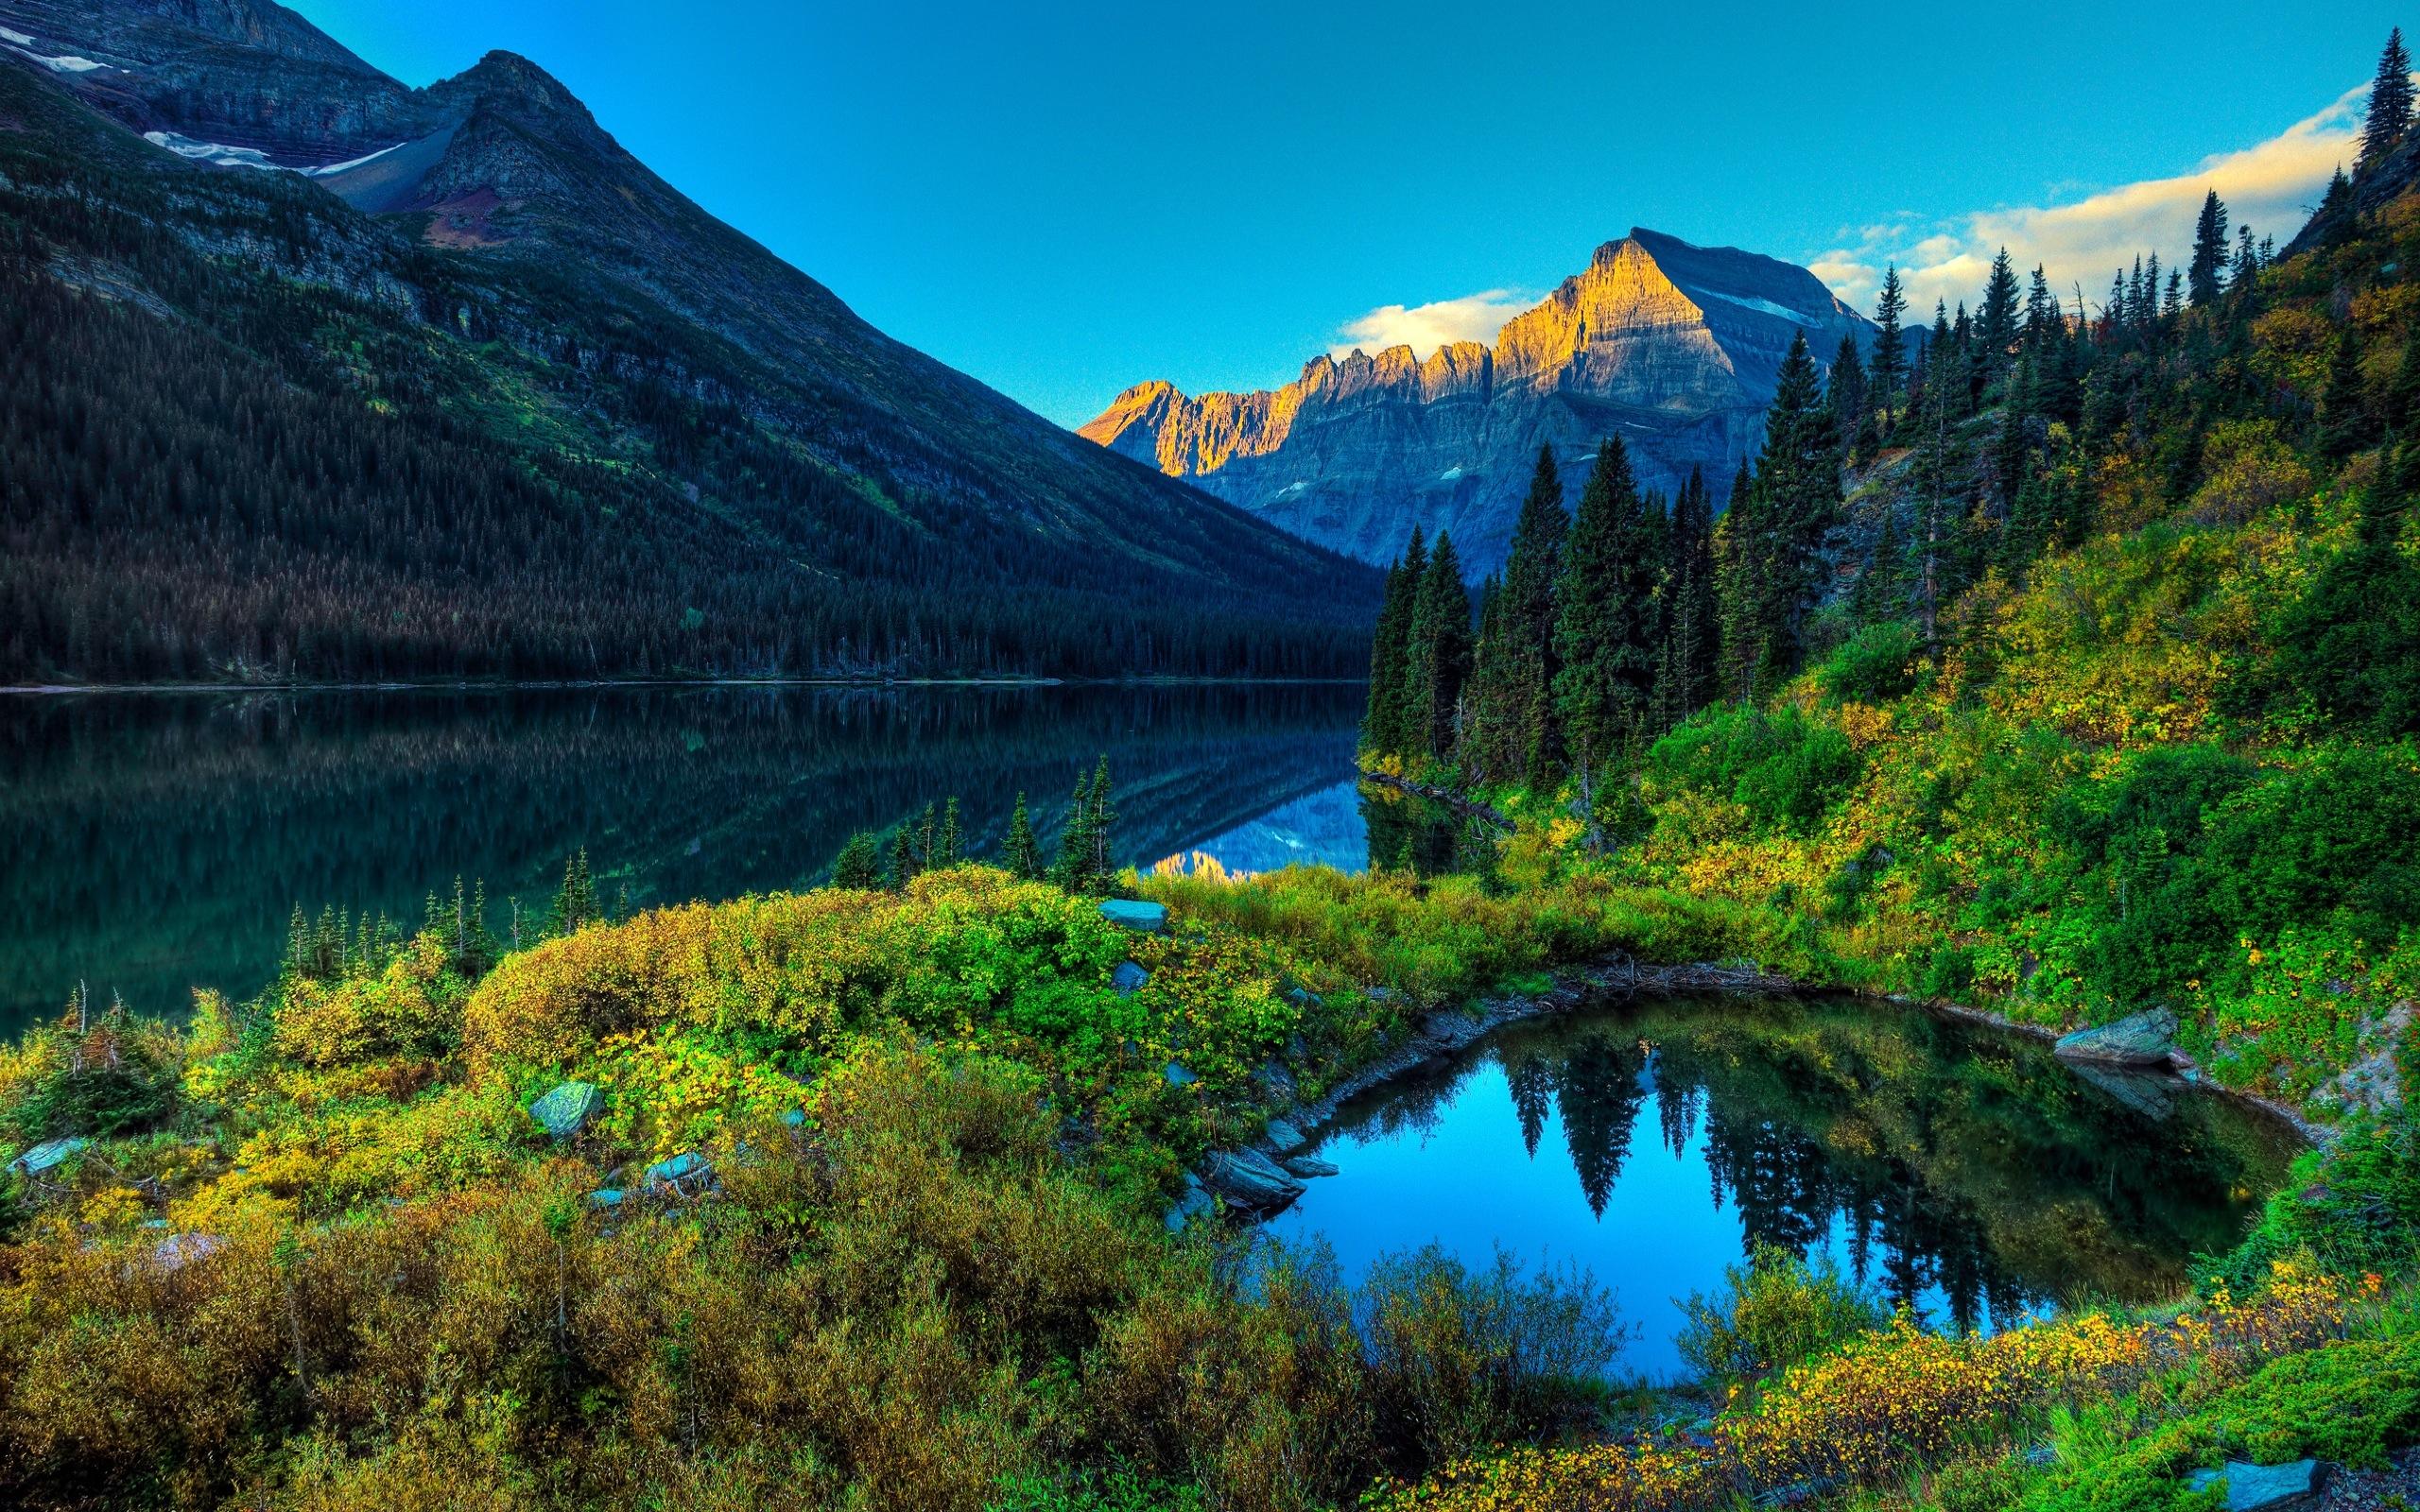 freelake mountain sceneryhdwallpapersfreedesktopbackgrounds